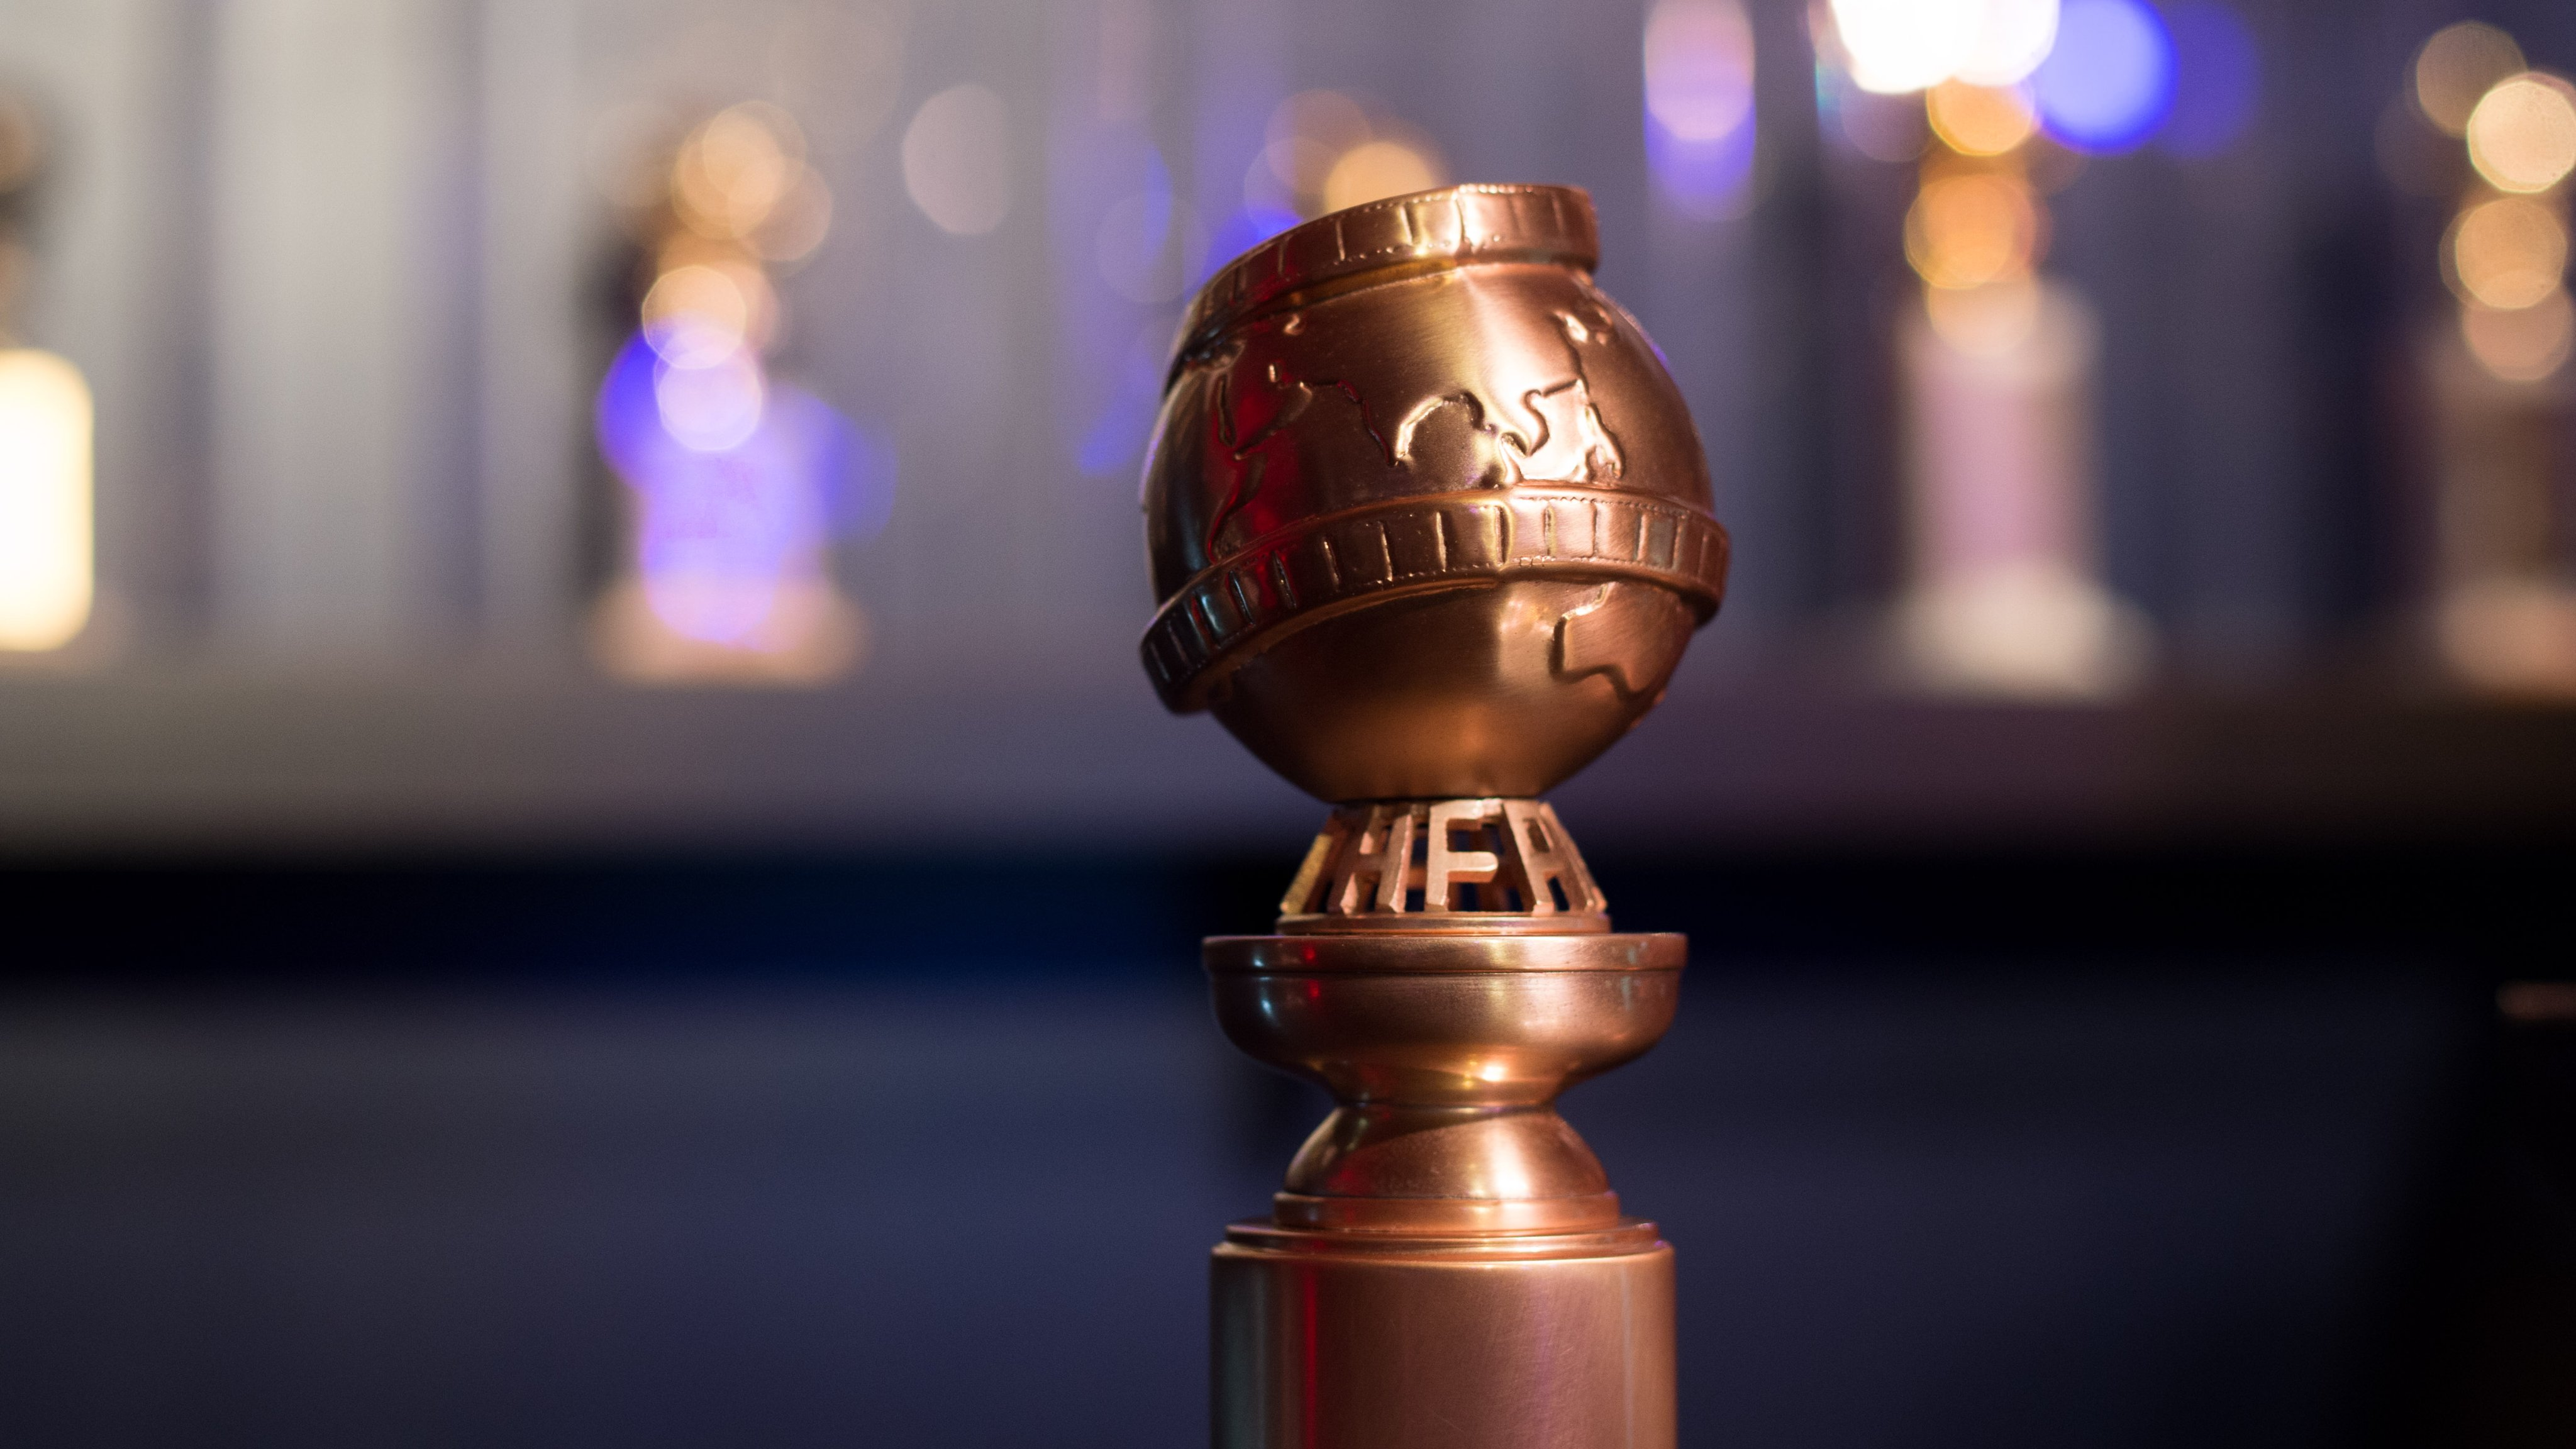 Golden Globes 2021 dove vederli diretta streaming satellite e digitale terrestre